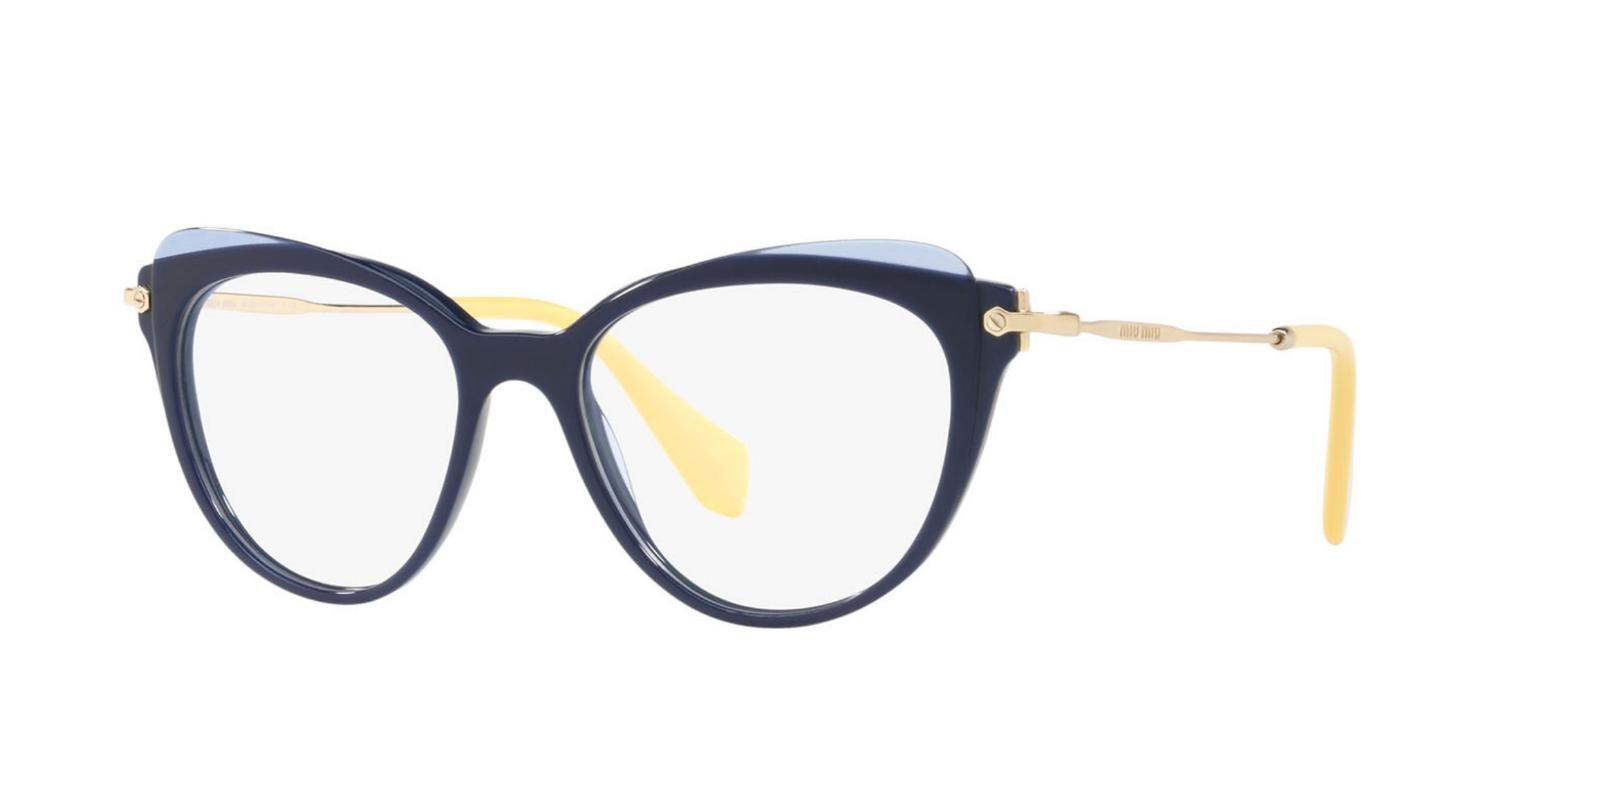 Miu Miu Eyeglass Frame: 27 listings